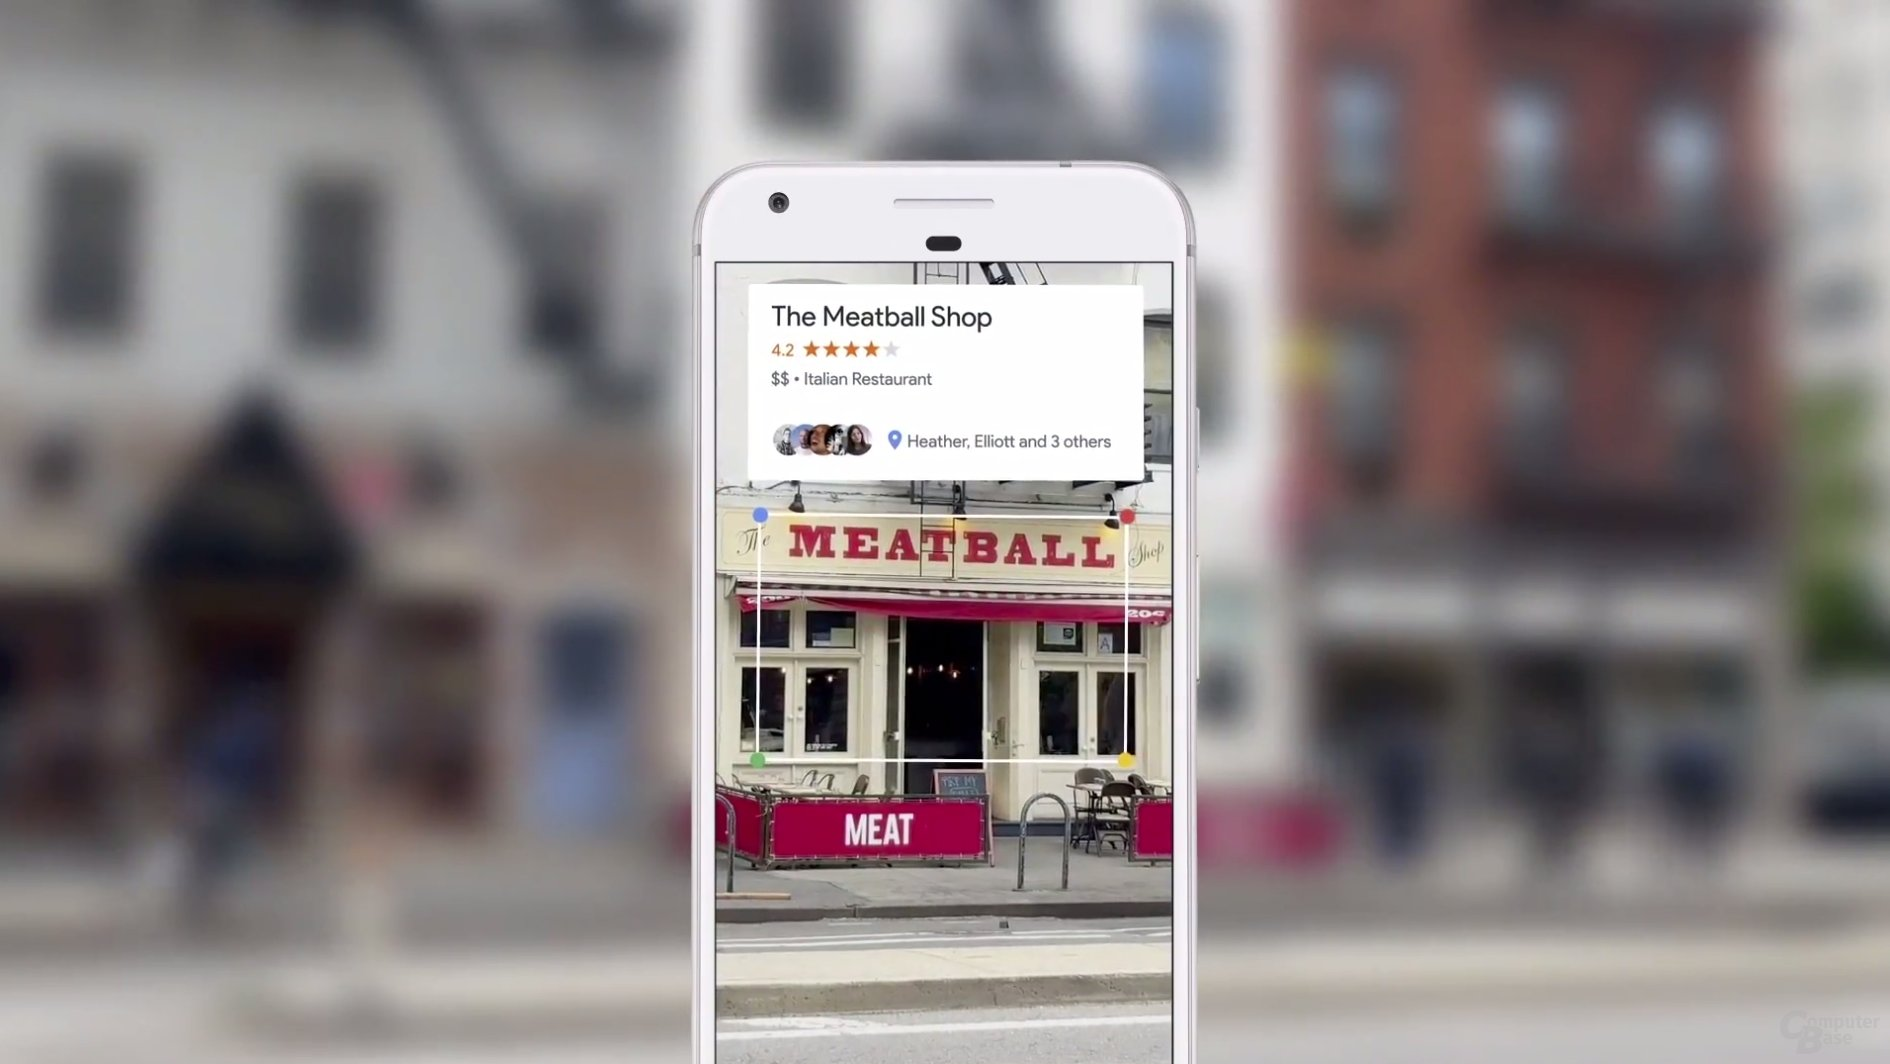 Google Lens erkennt Restaurants